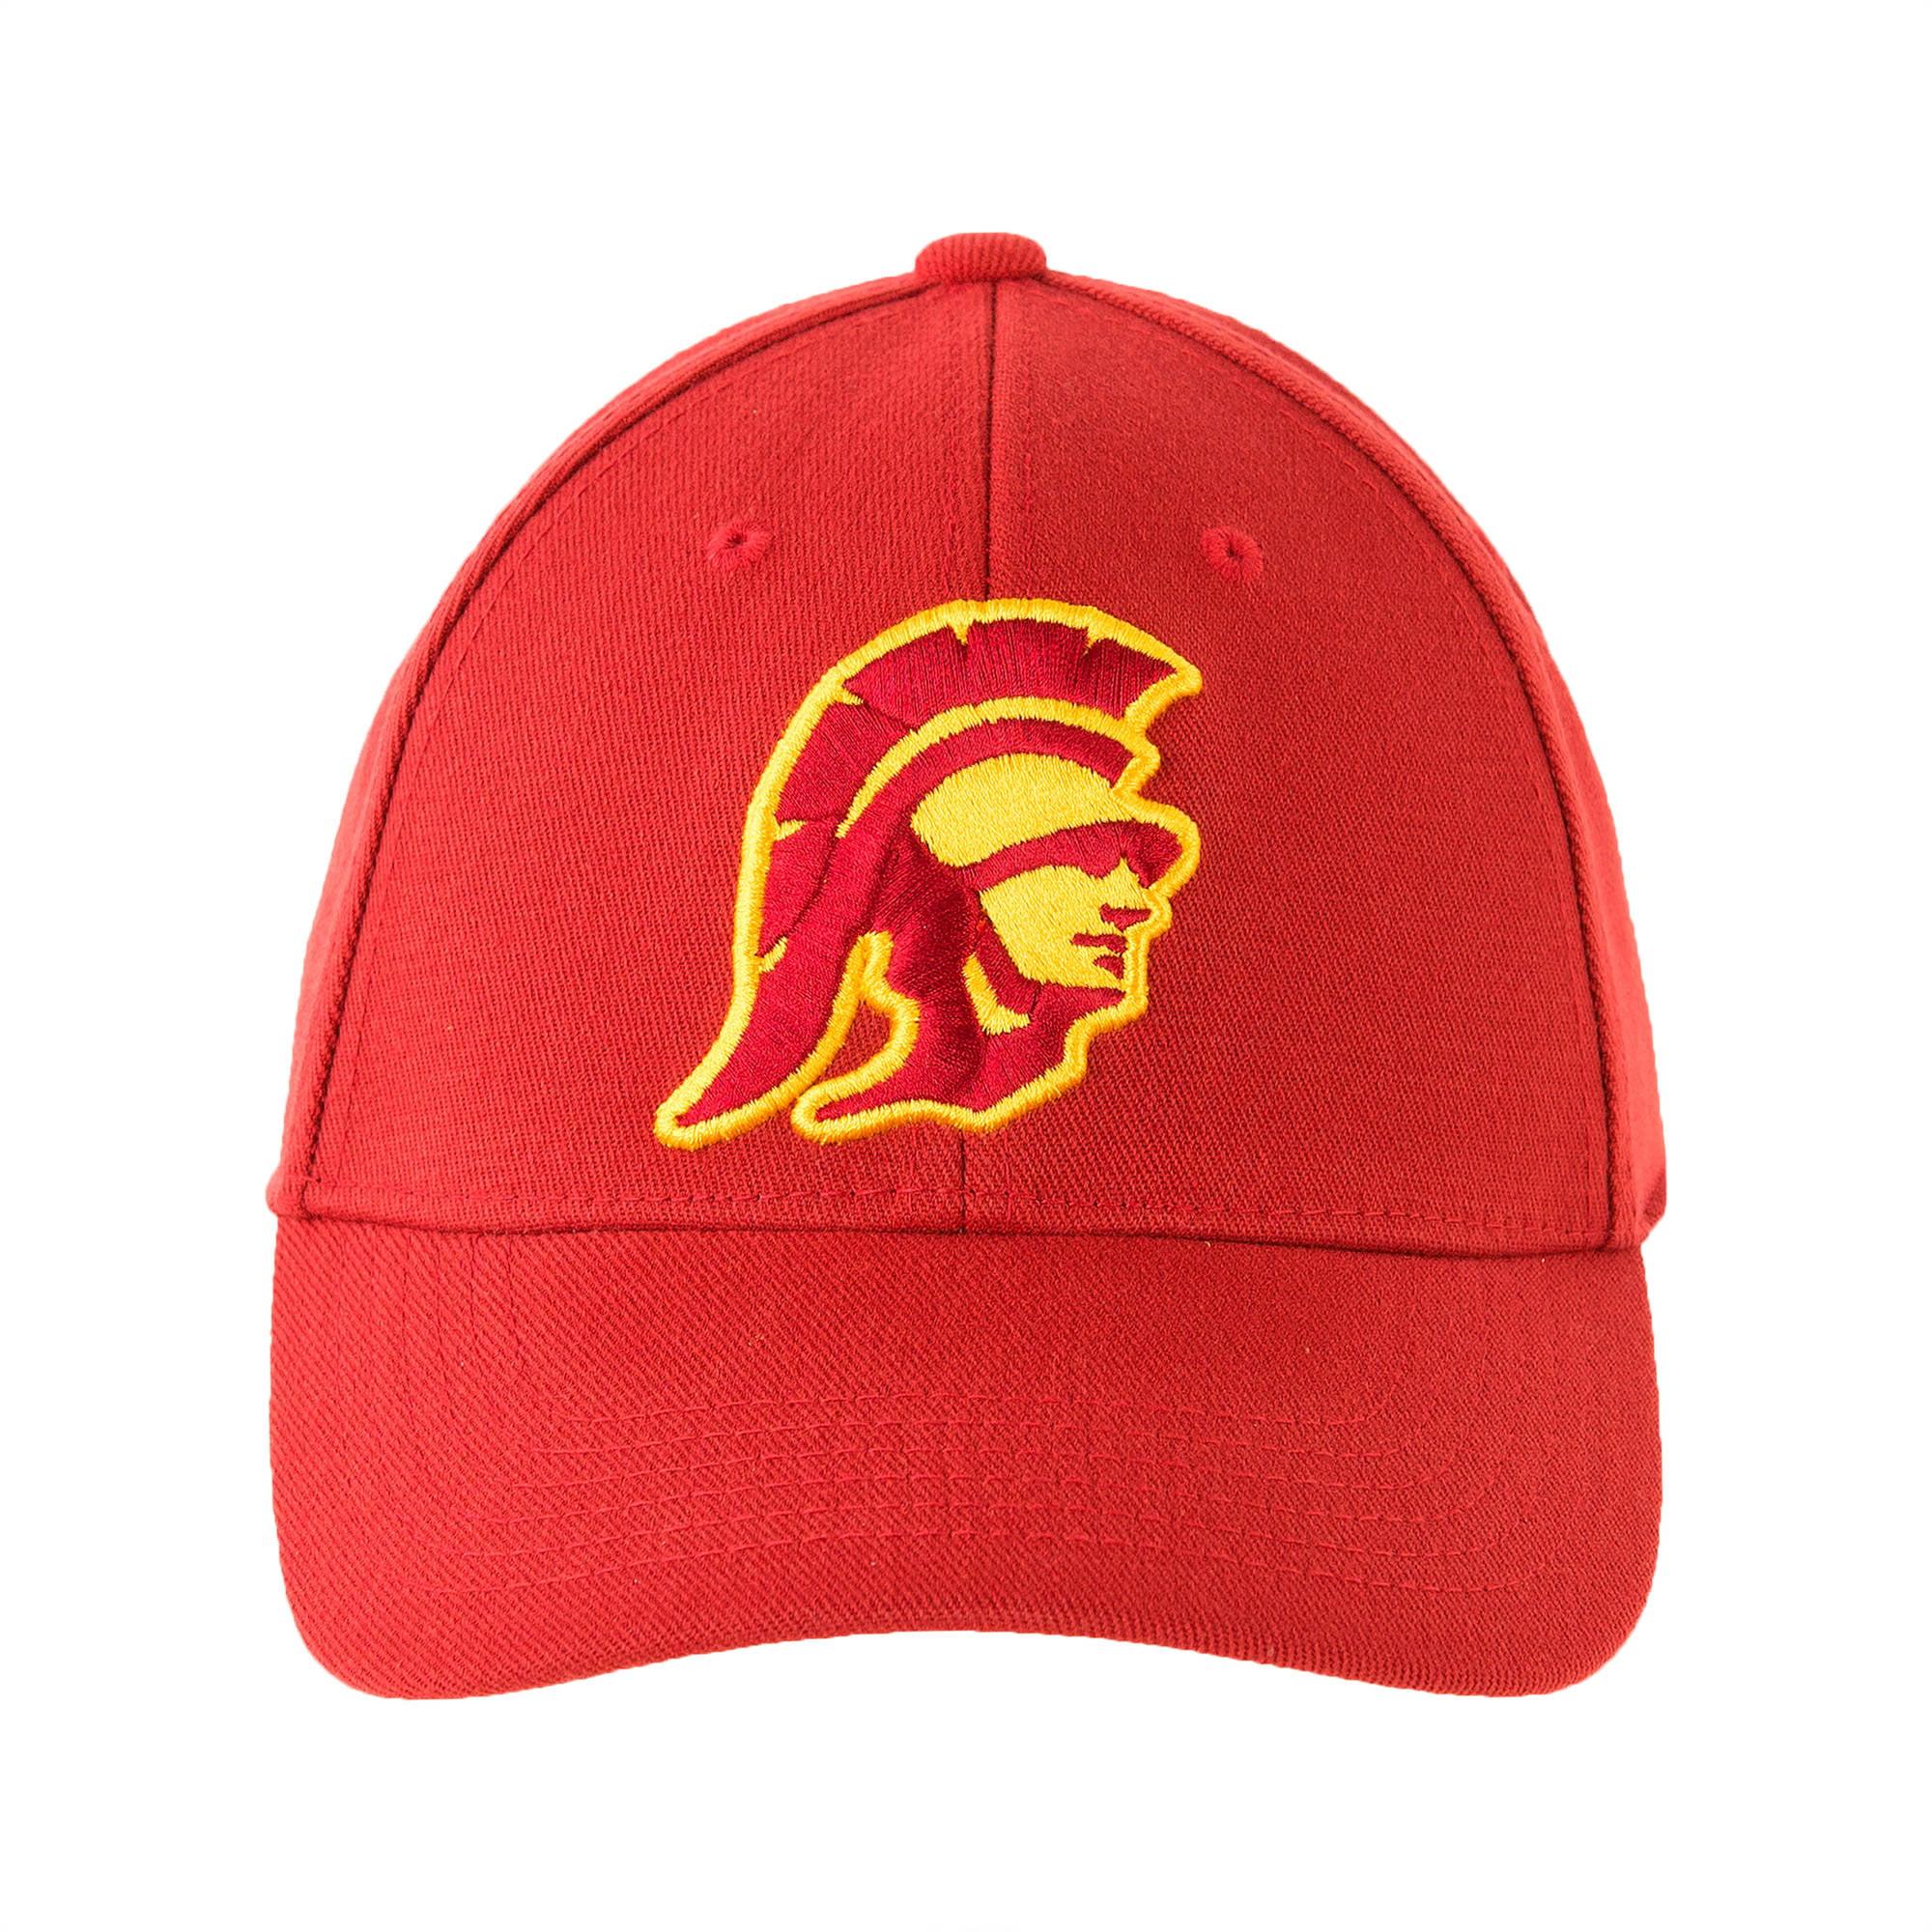 NCAA USC Trojans Shield Flex Fit Cap